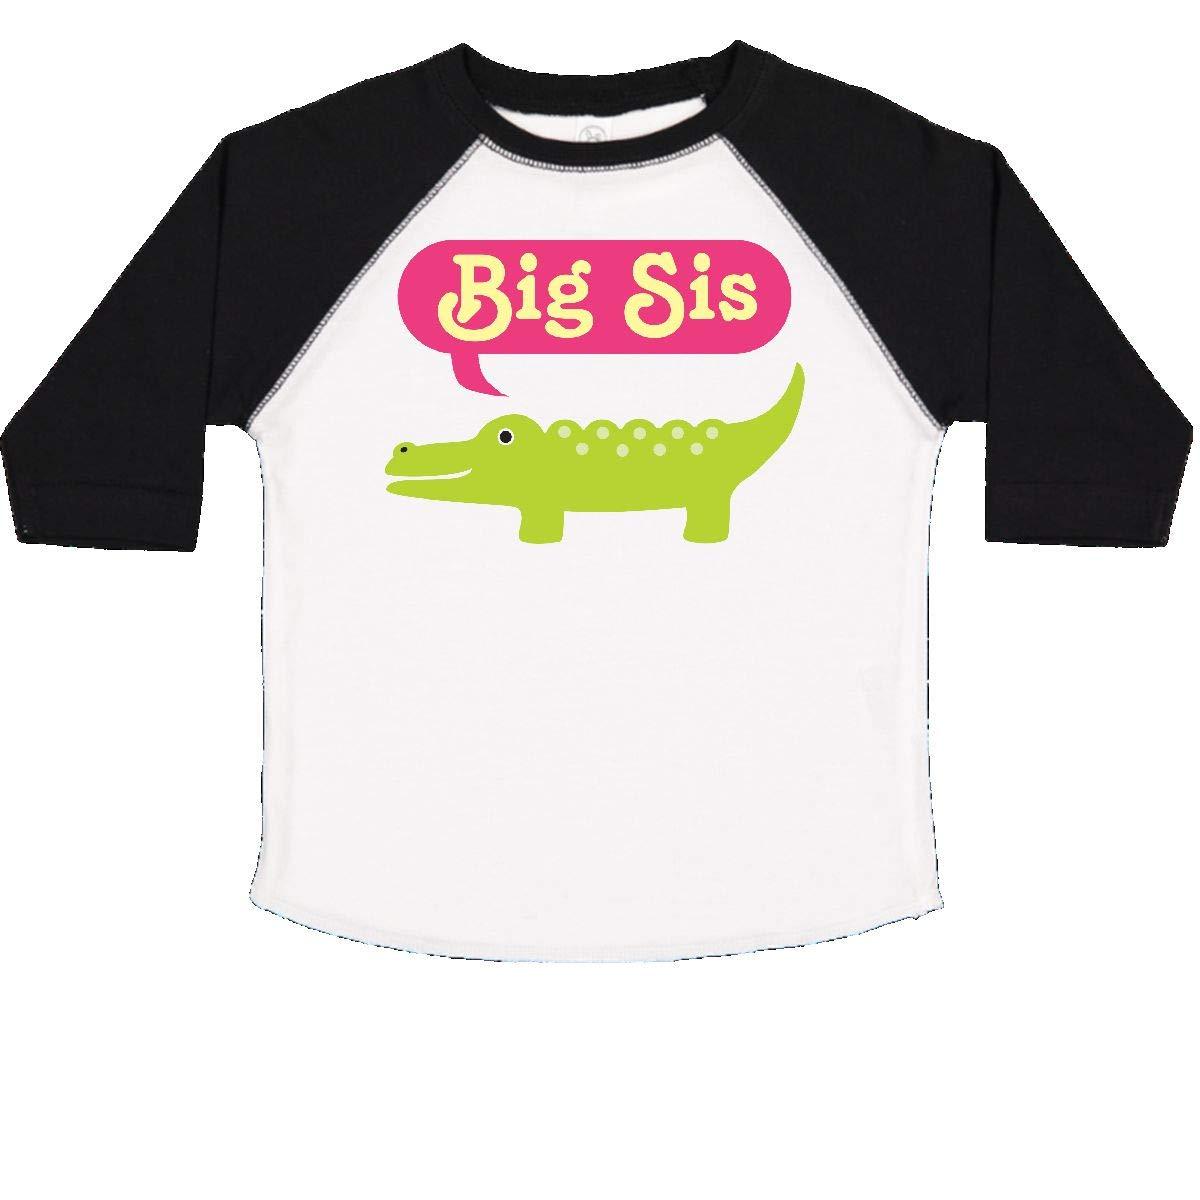 inktastic Big Sis Alligator Girls Sister Announcement Toddler T-Shirt